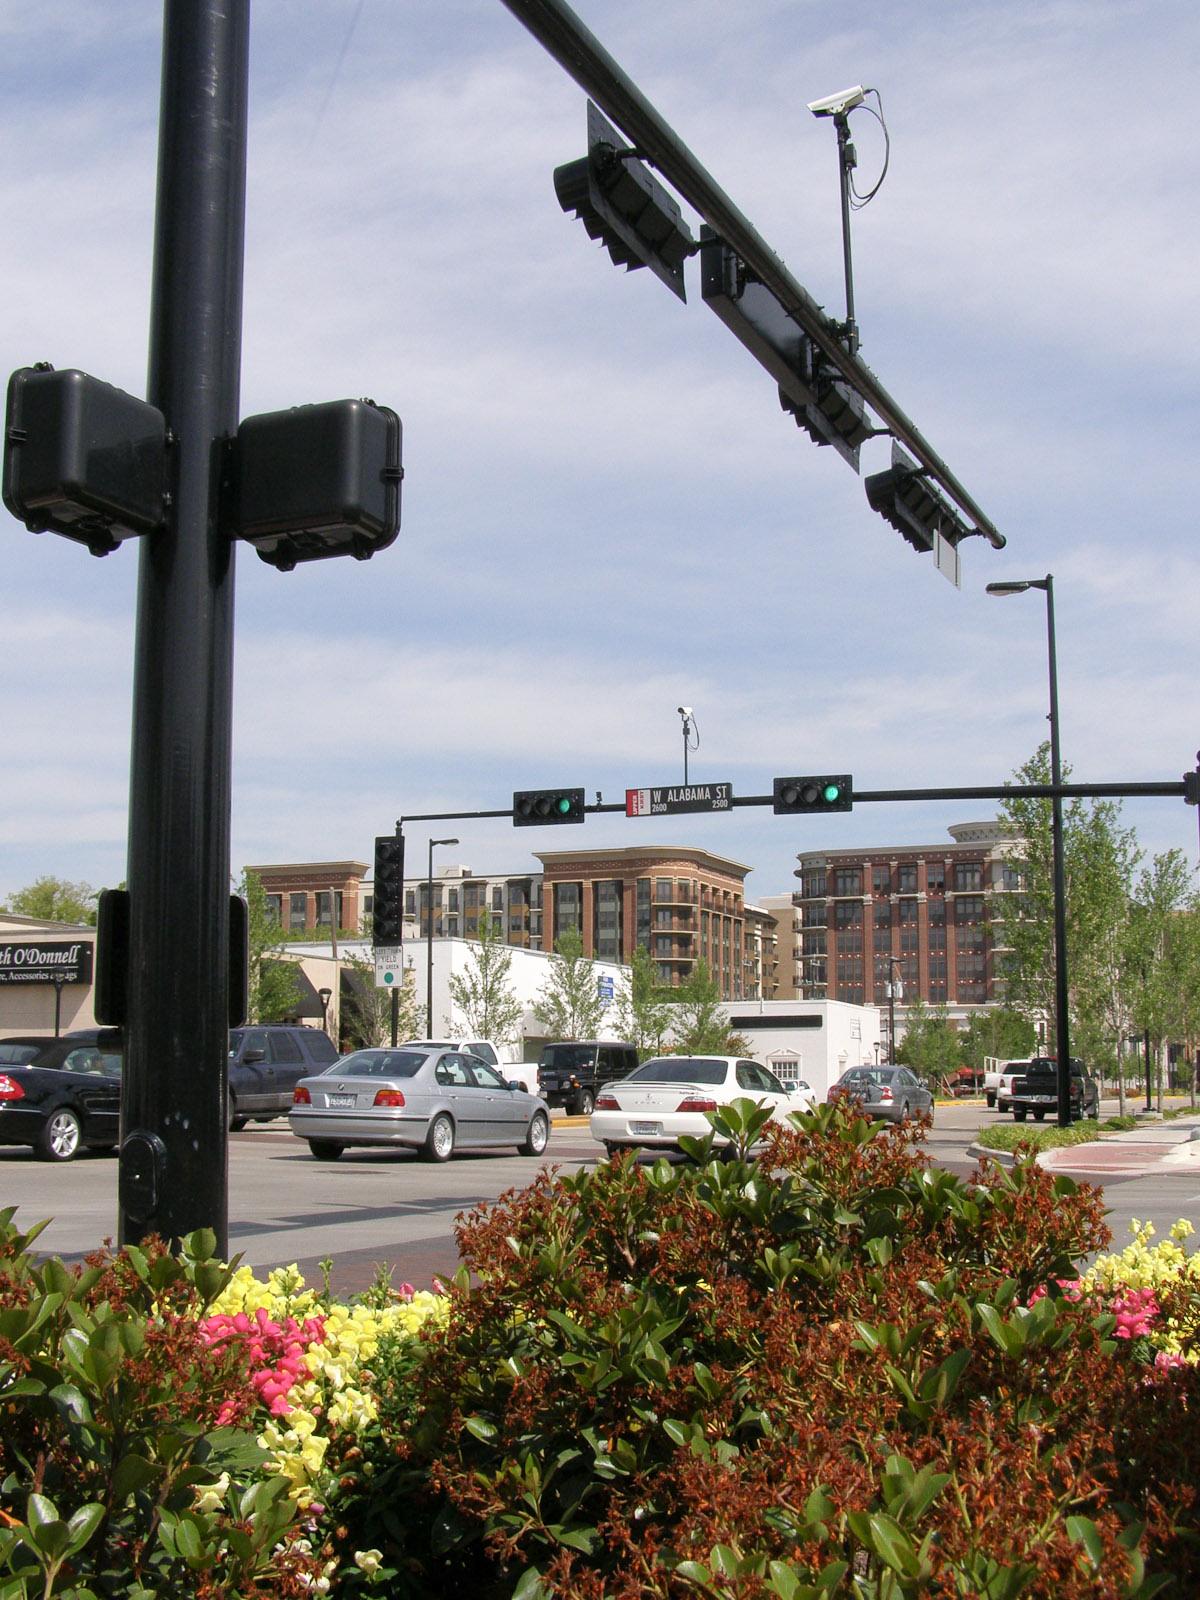 With traffic cameras gone, red light violations skyrocket